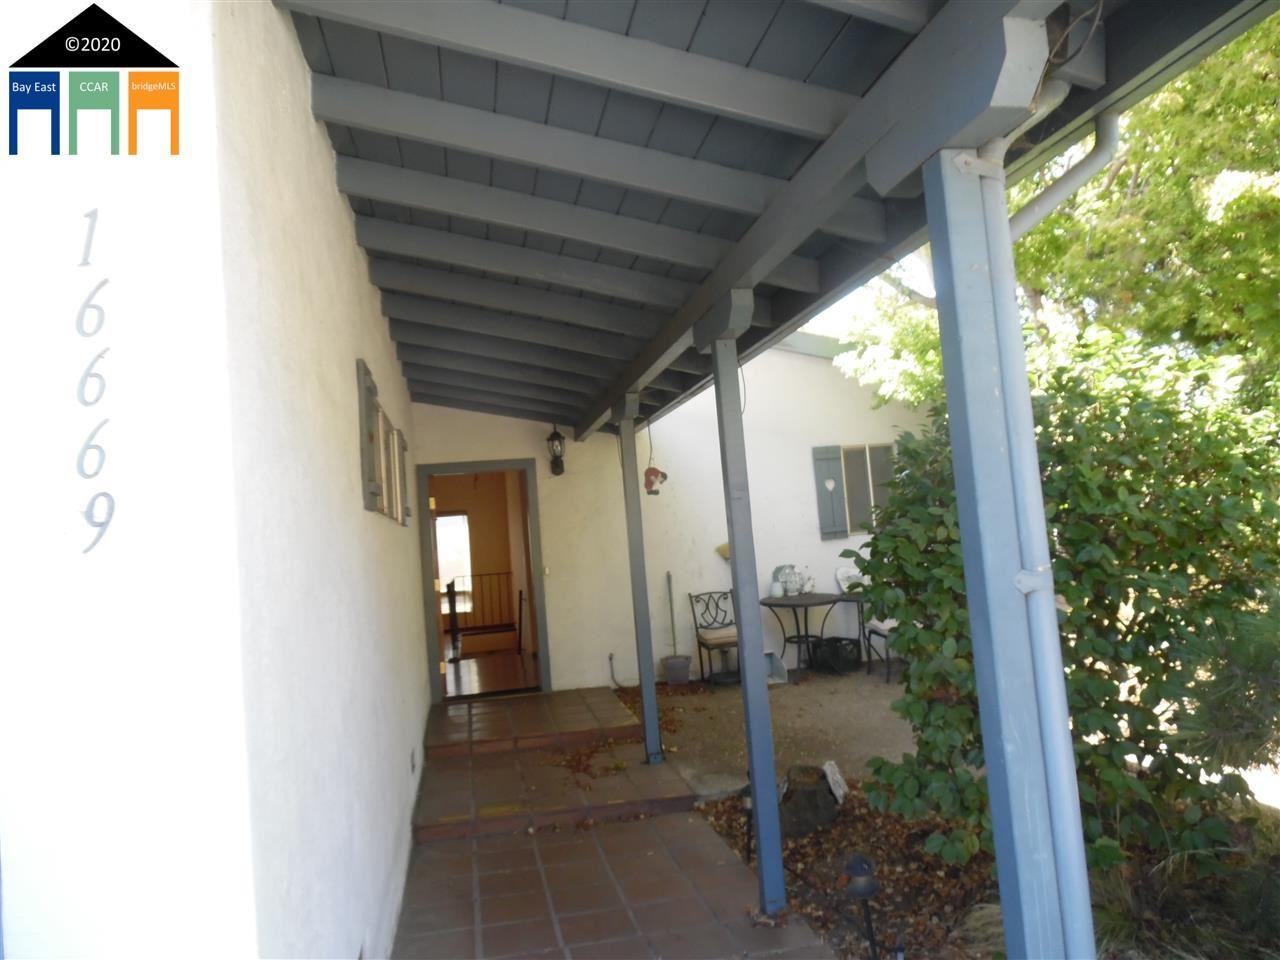 16669 Winding, San Leandro, CA 94578 - #: 40897952